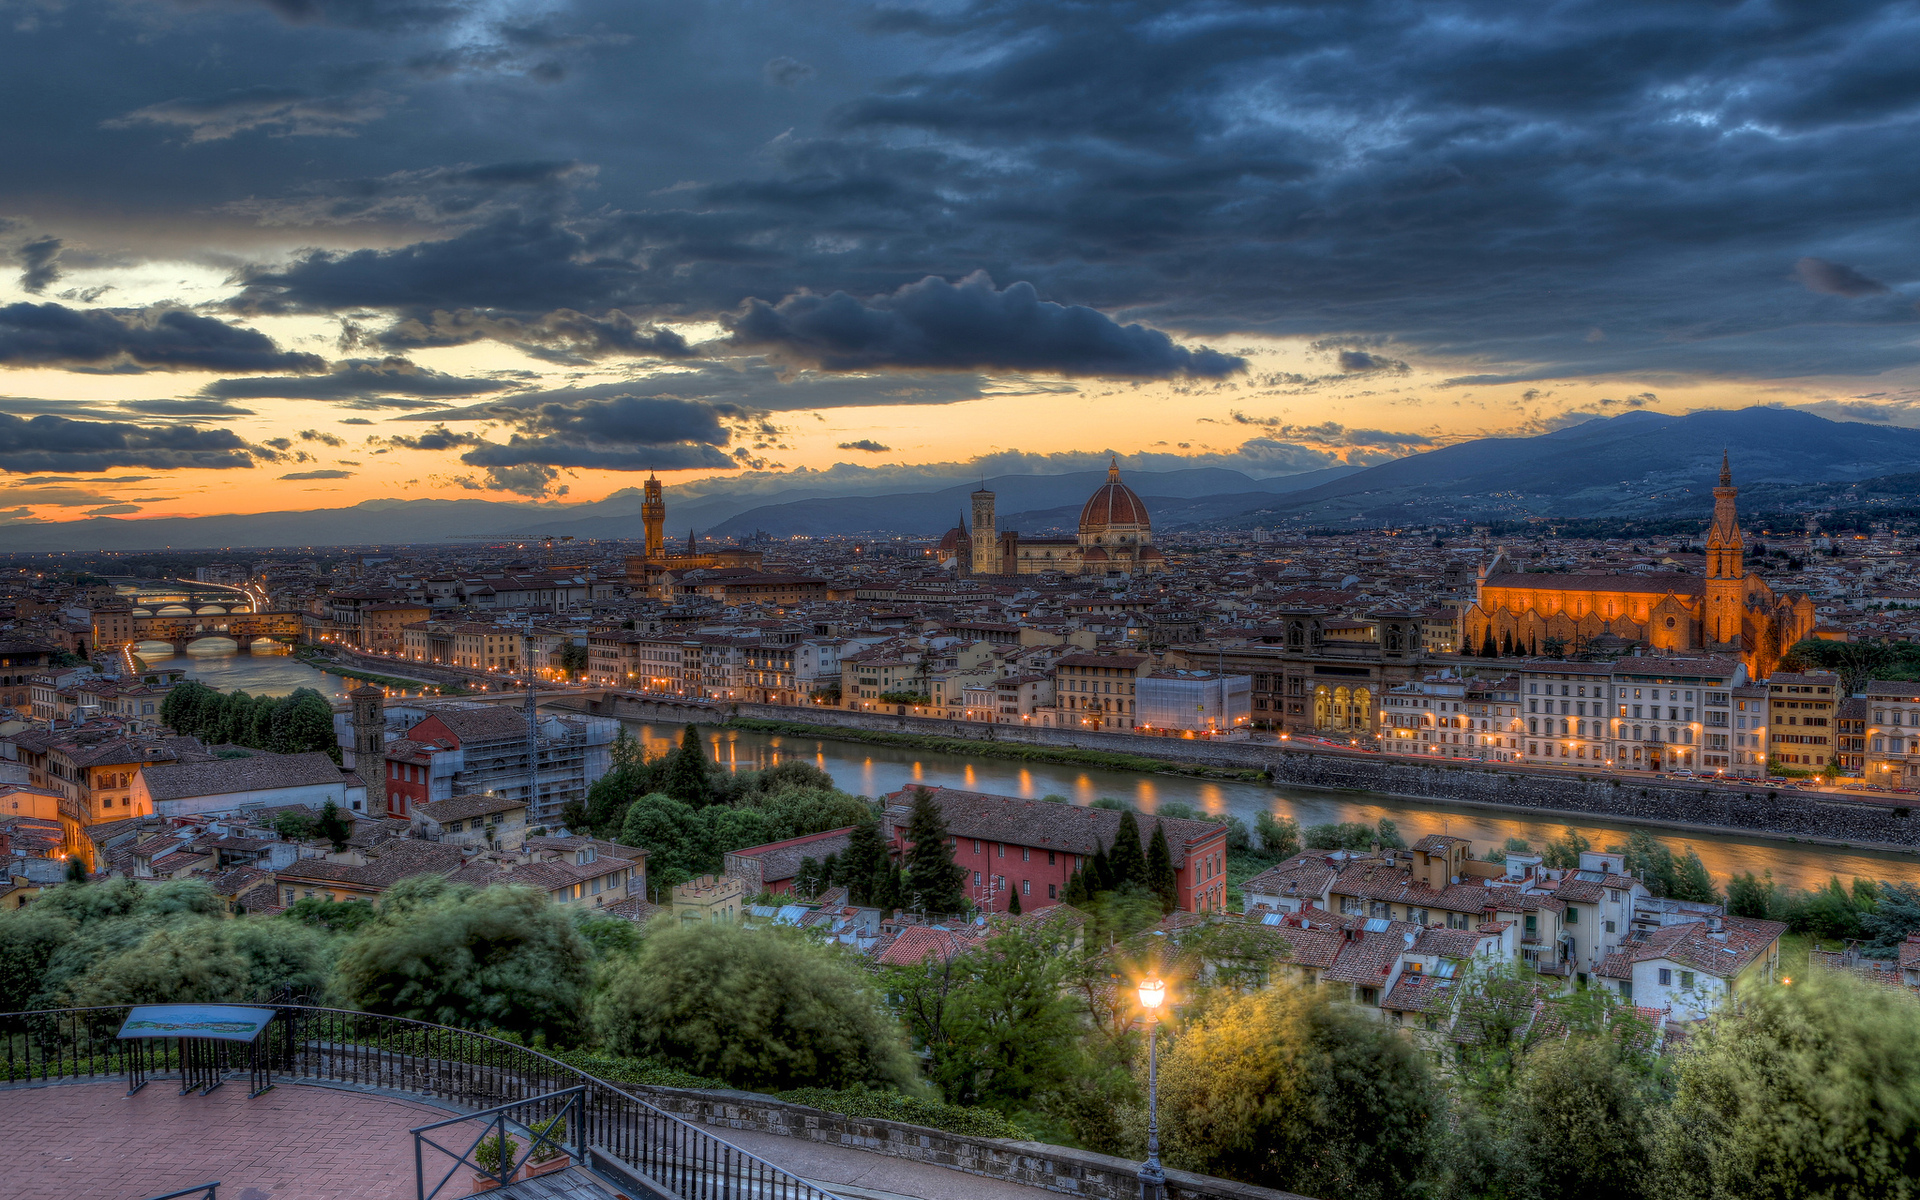 Florence-(Tuscany,-Italy)